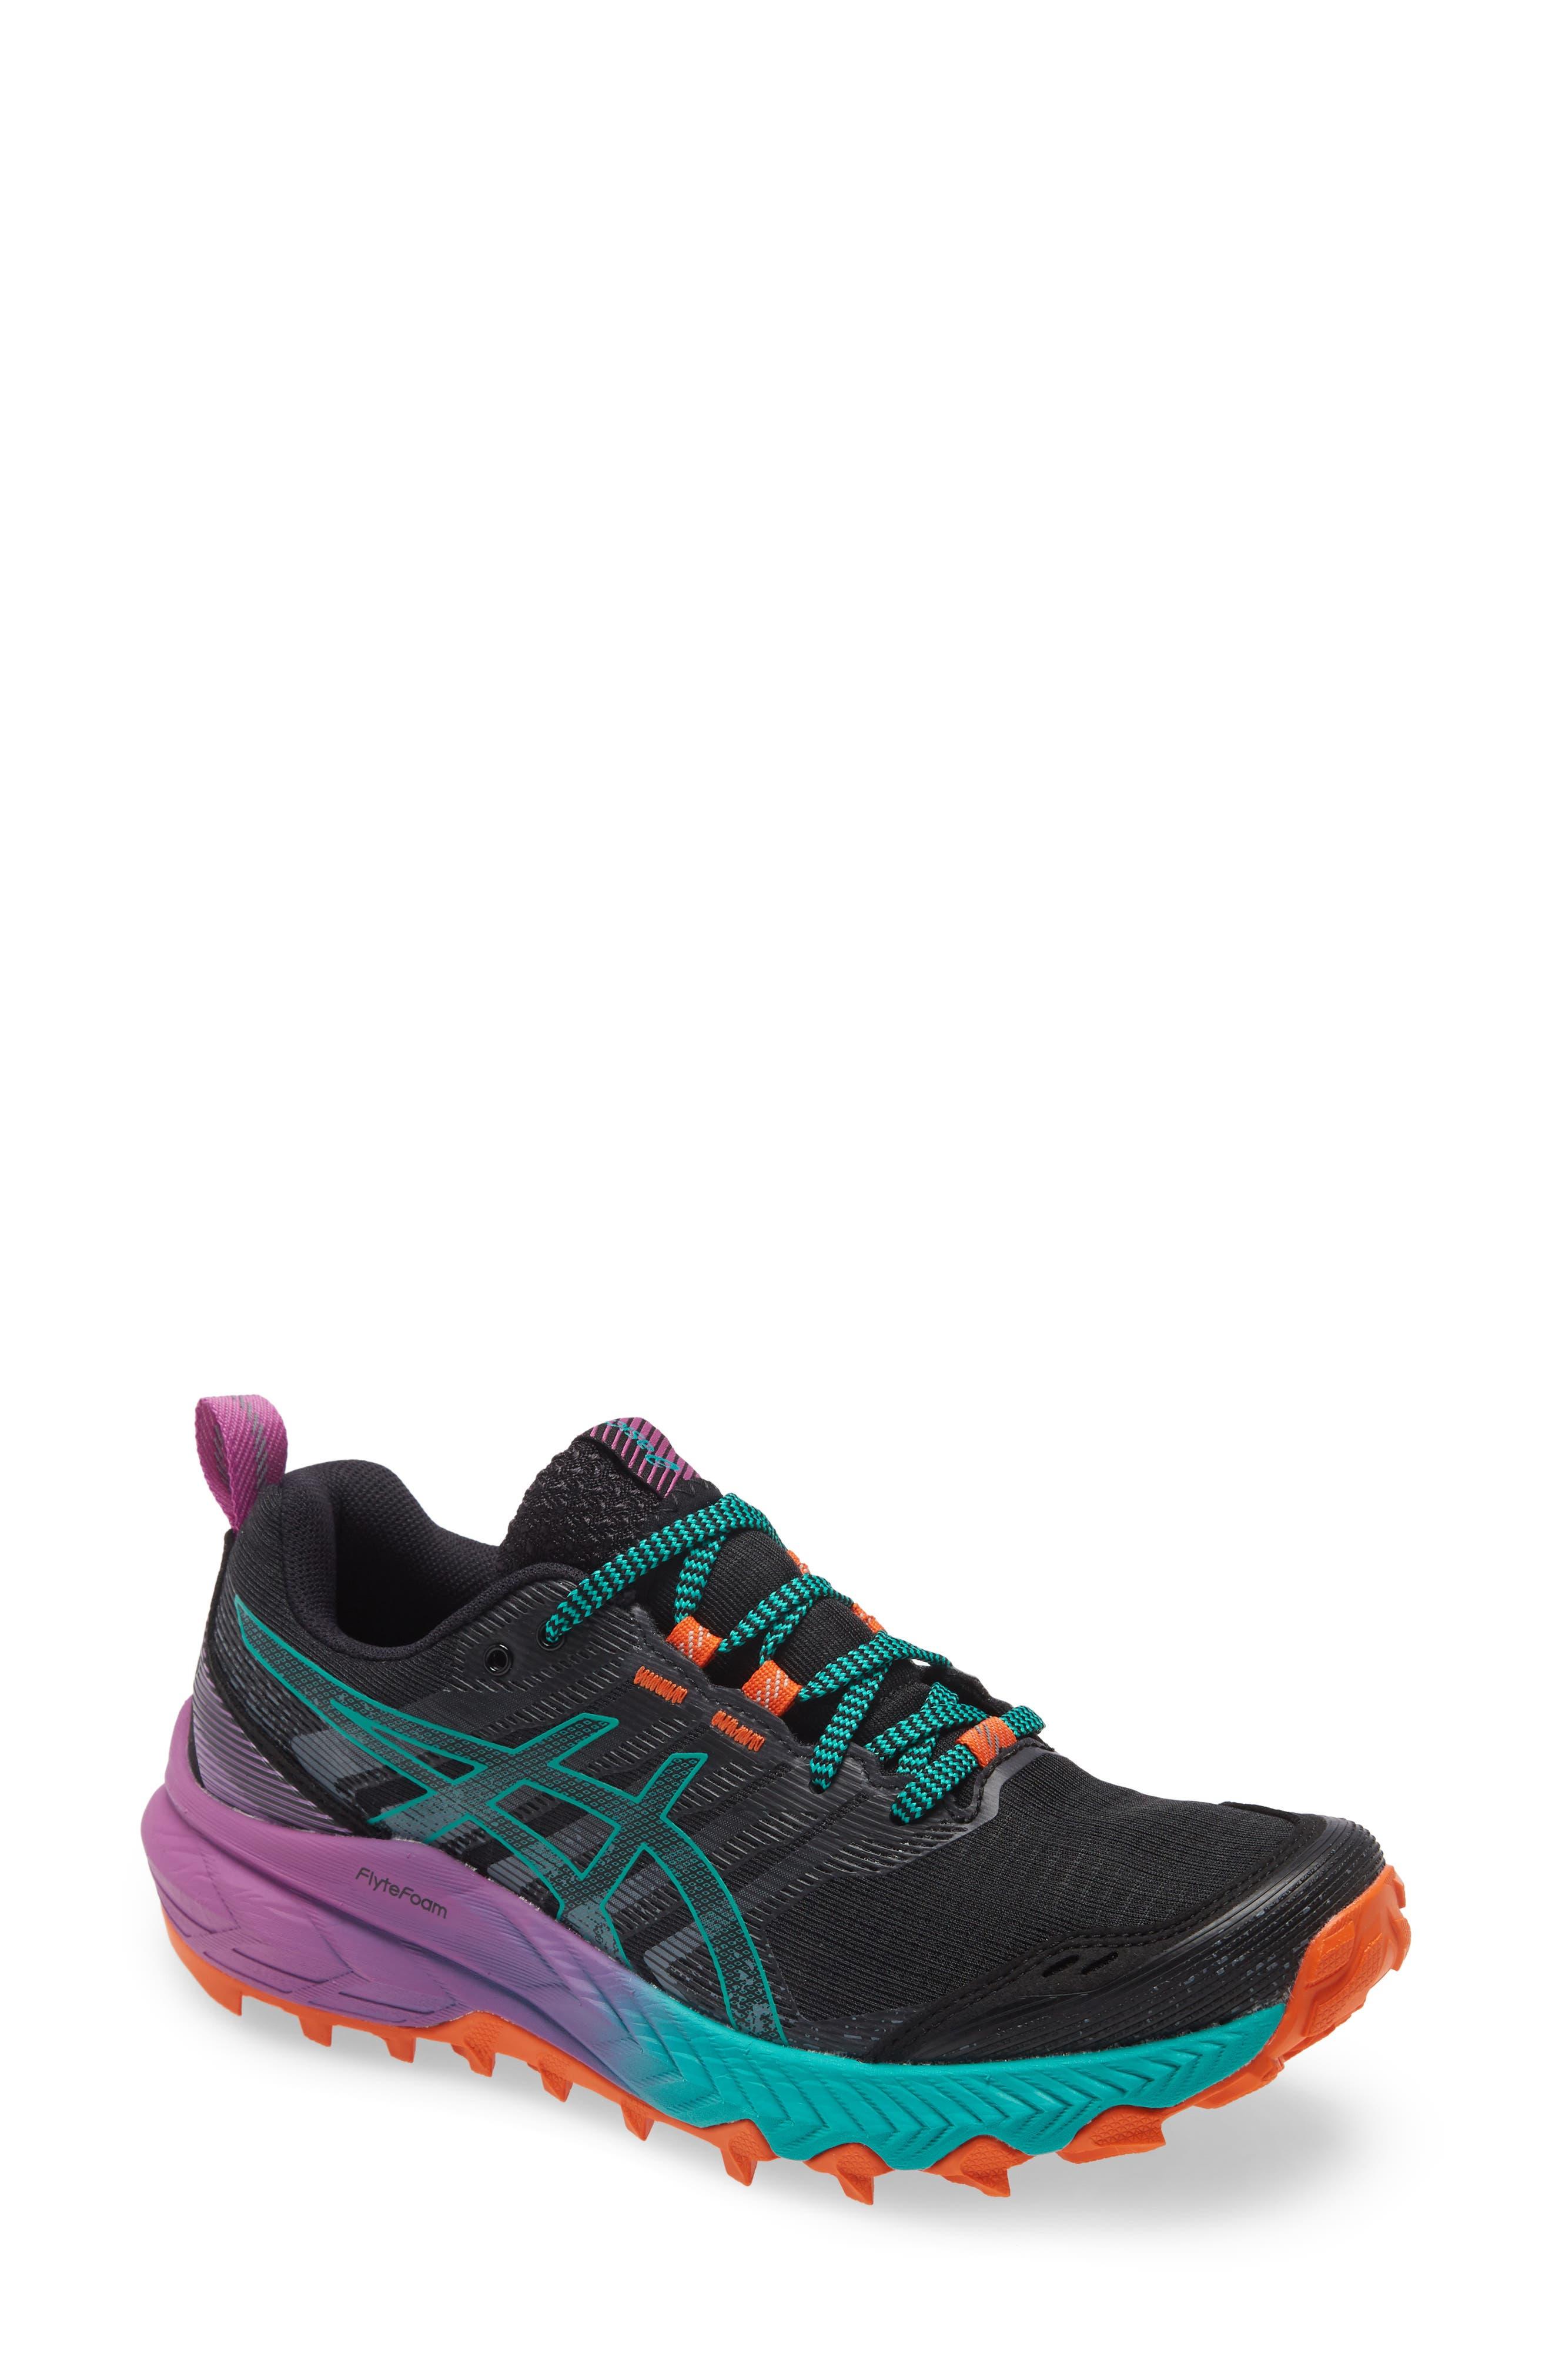 Women's Asics Gel-Trabuco 9 Trail Running Shoe